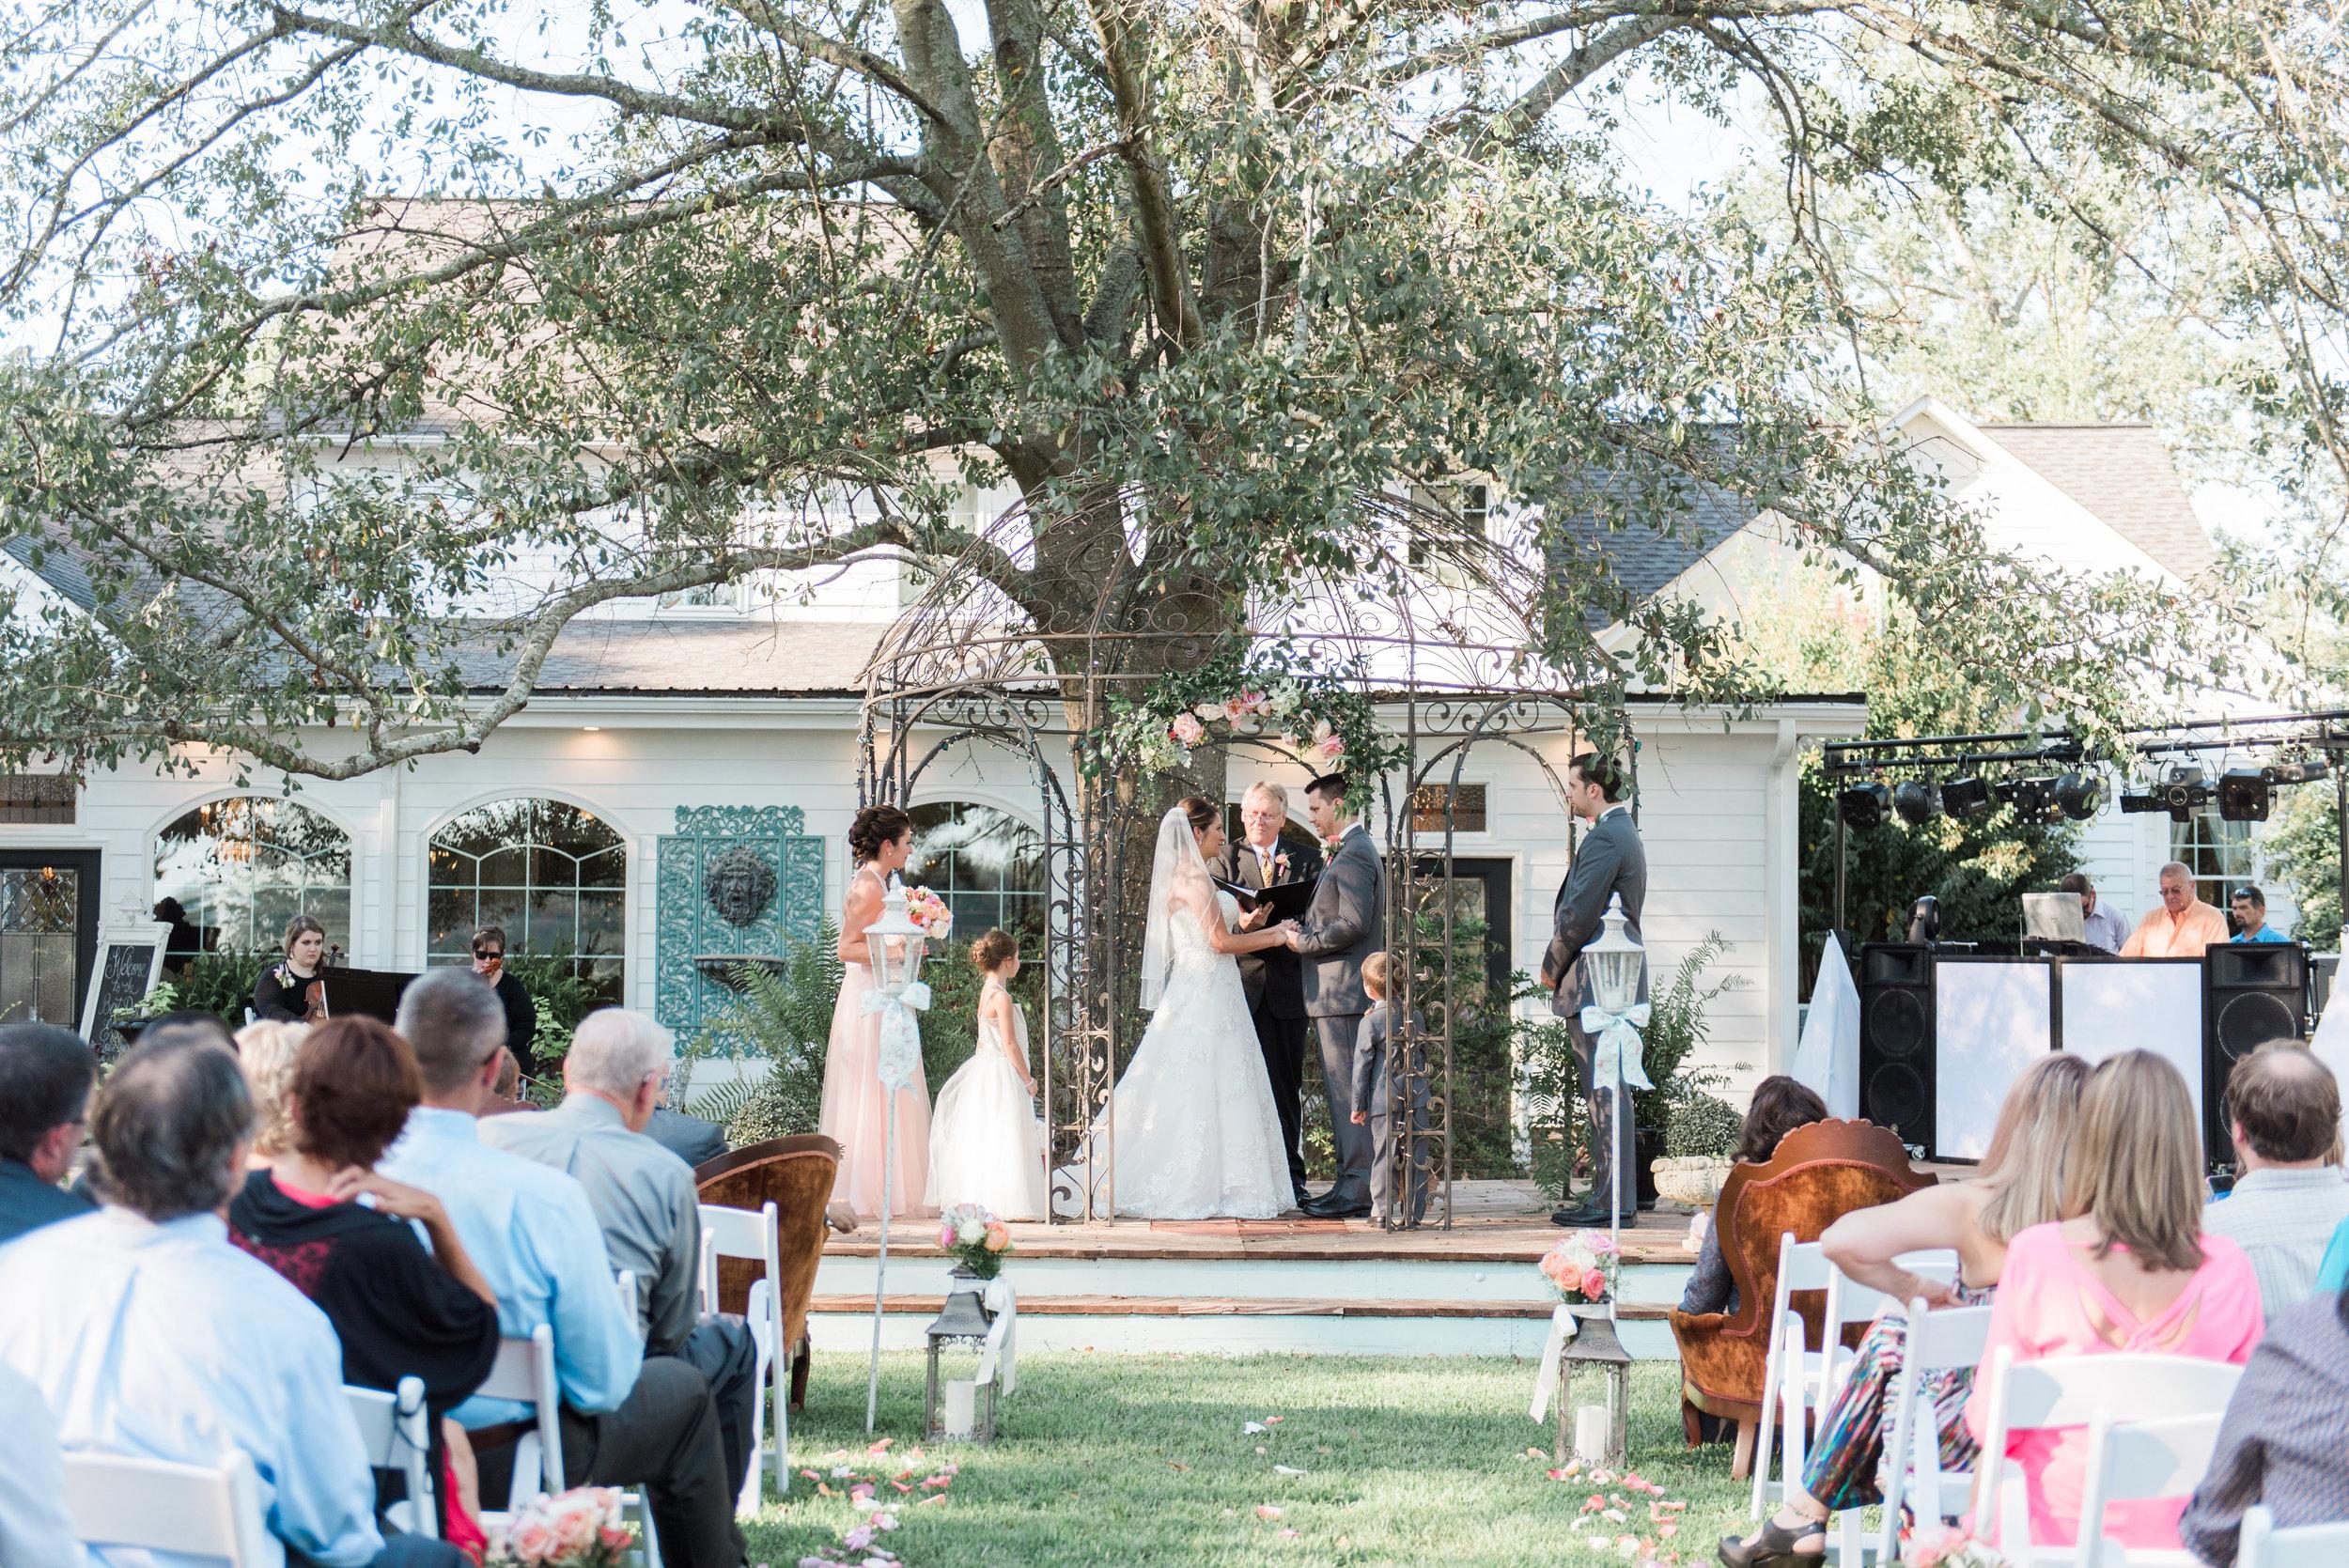 Danielle and Butch s Wedding-Ceremony-0064.jpg